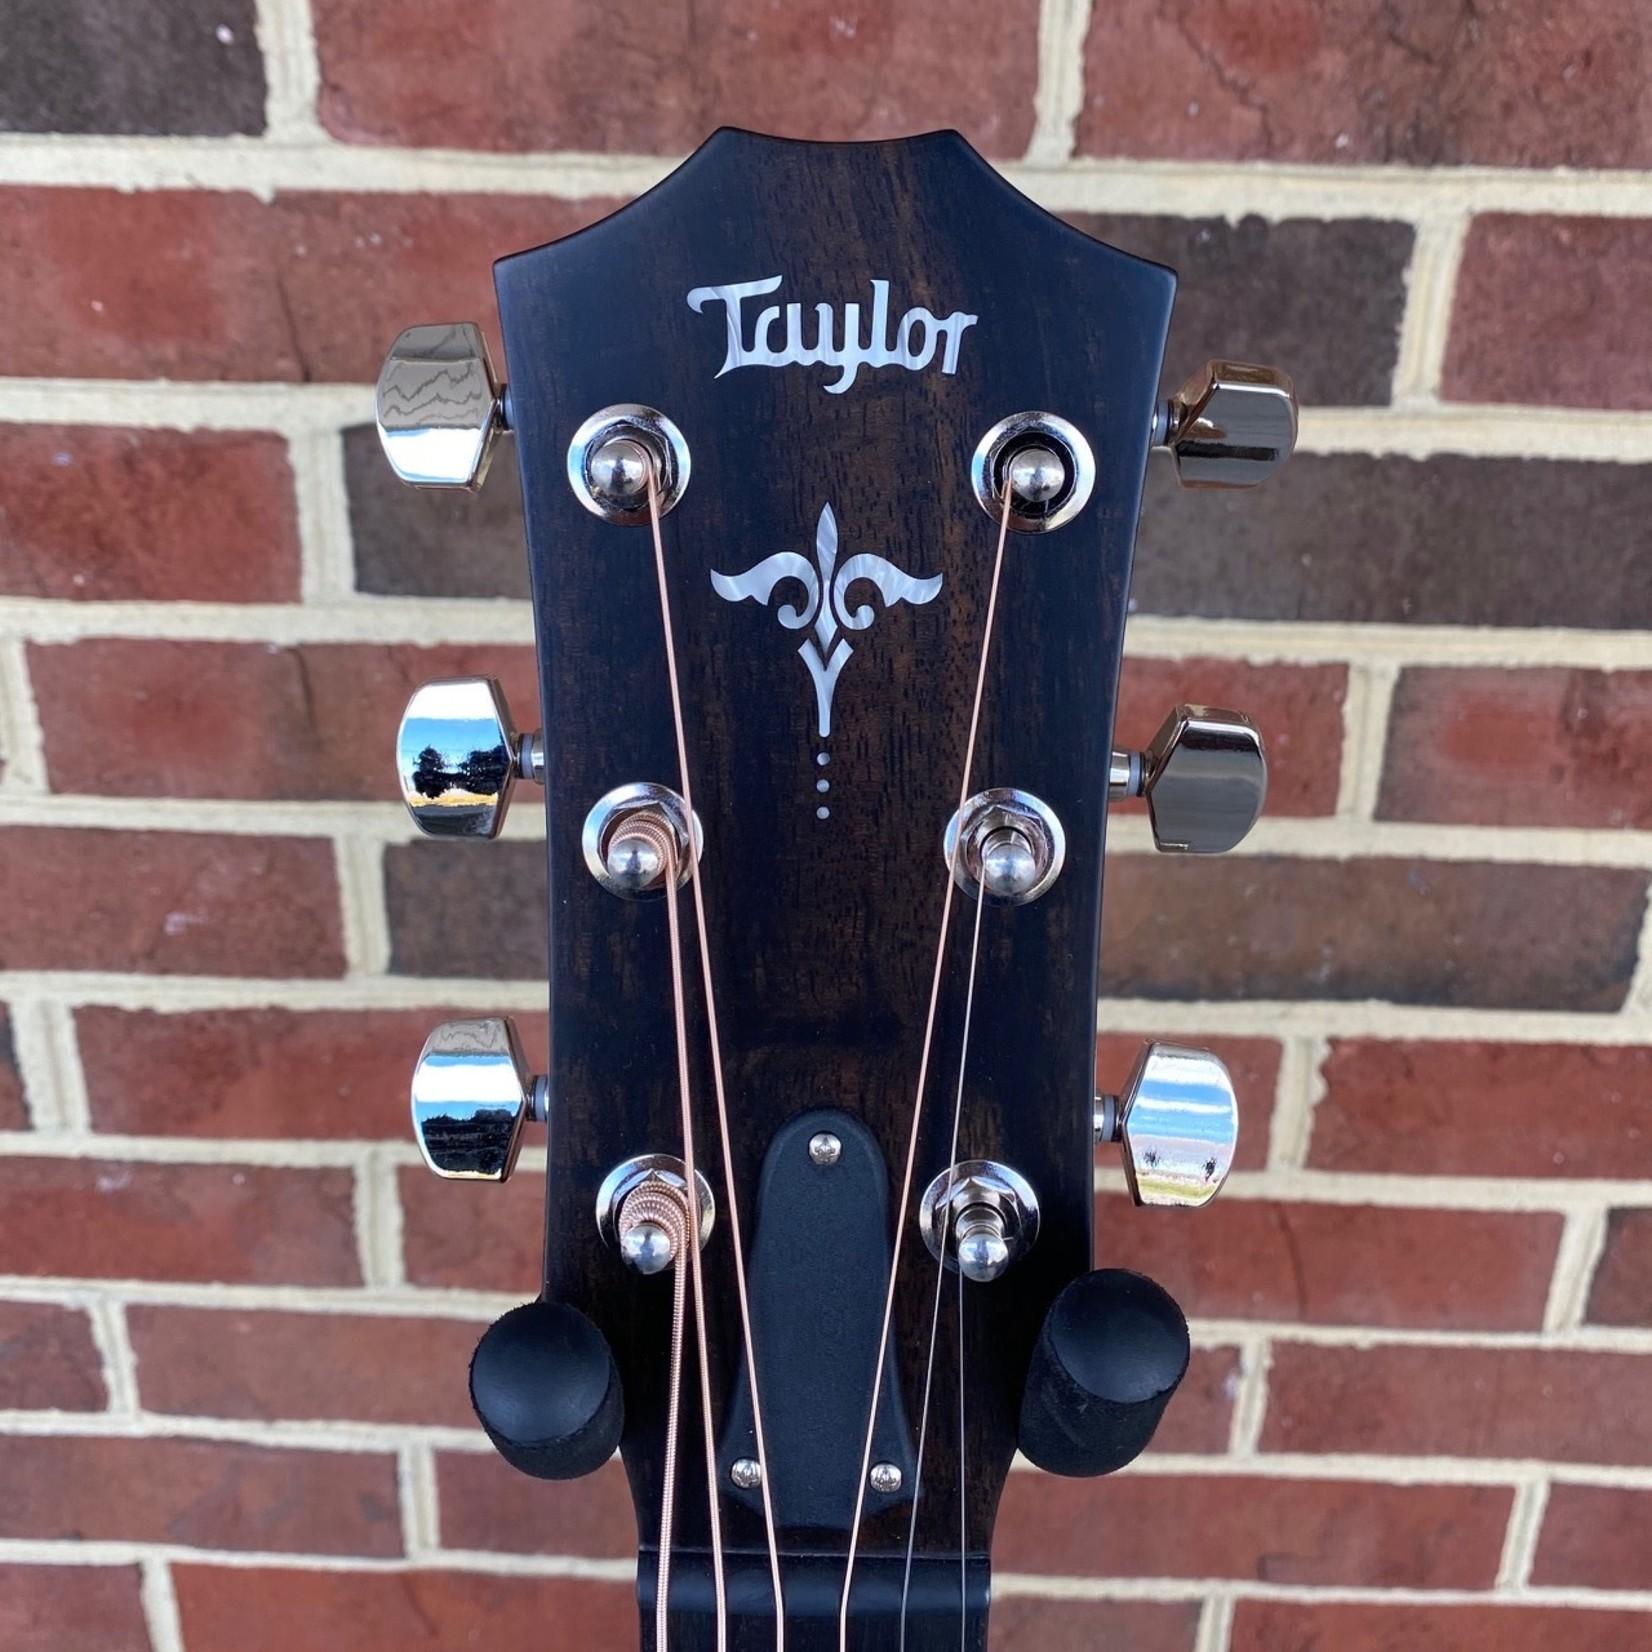 Taylor Taylor E14ce, Ebony Series, Sitka Spruce Top, West African Ebony Back and Sides, ES2 Electronics, Hardshell Case